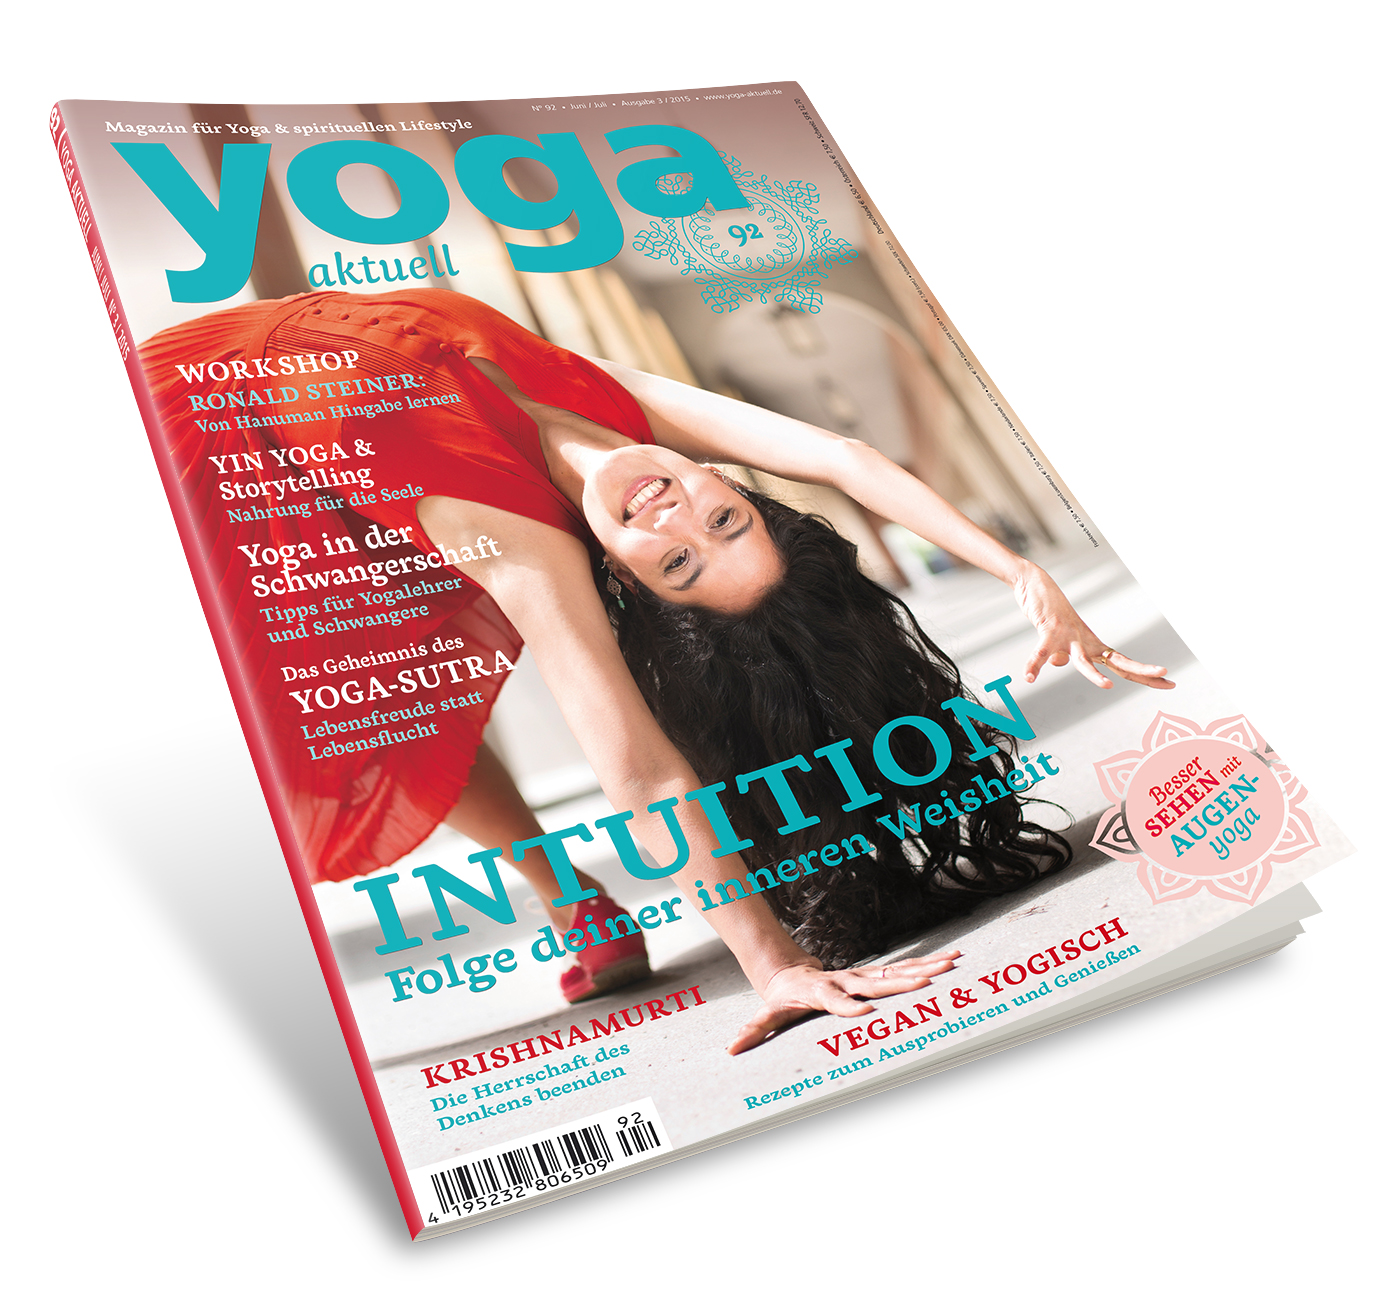 Yoga Aktuell 92 - 03/2015